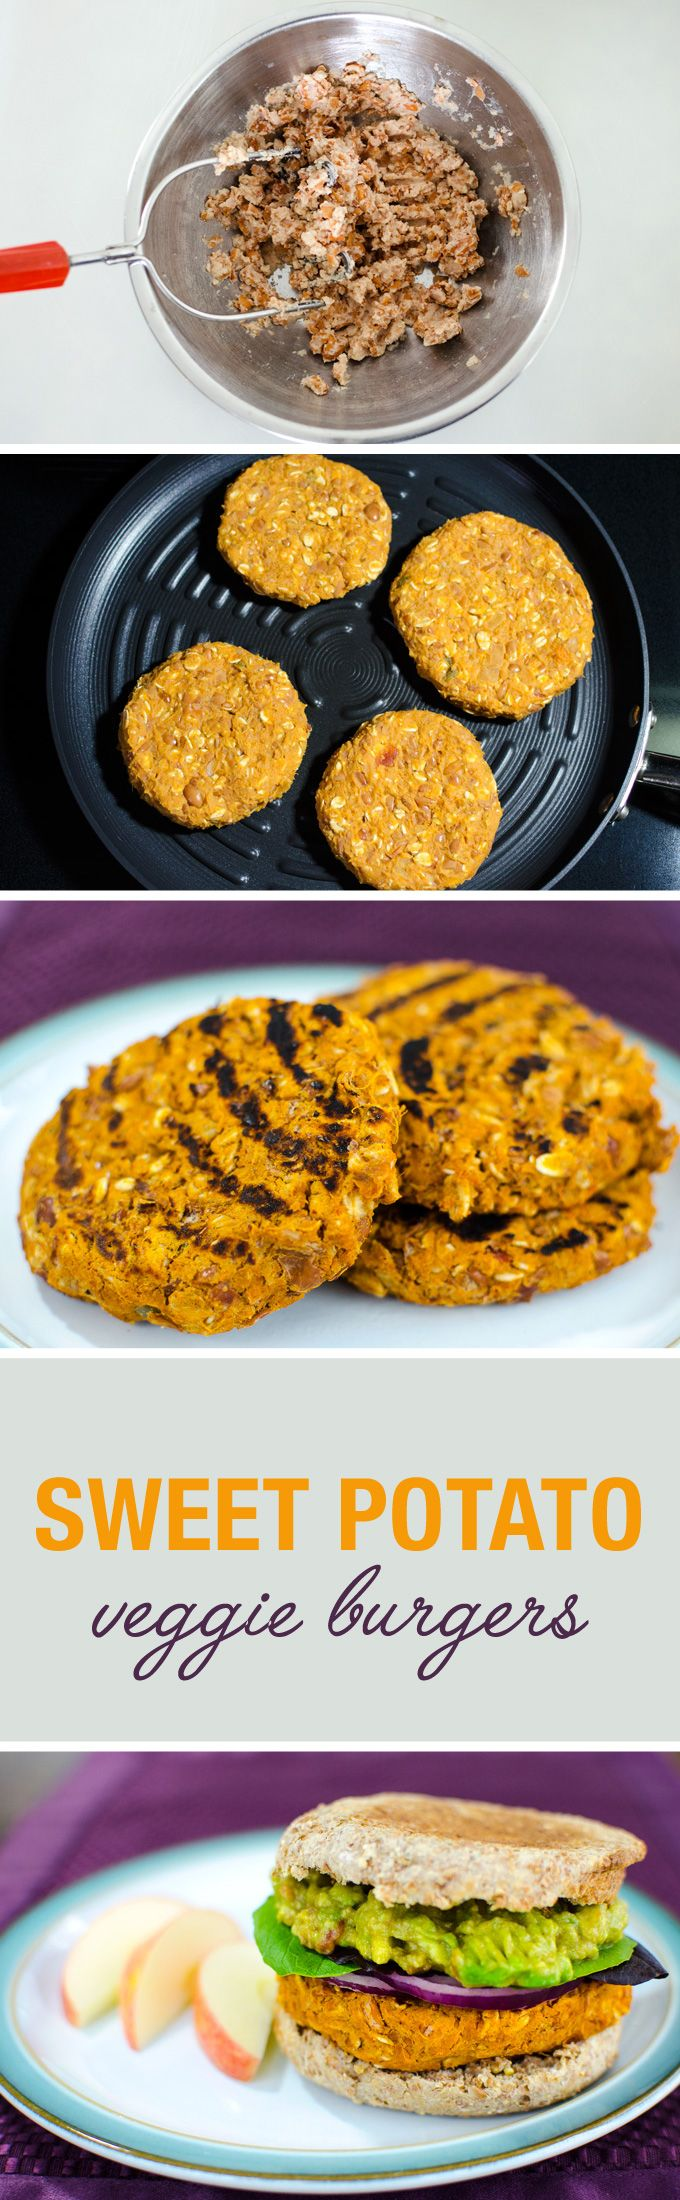 Sweet Potato Veggie Burgers with quick guacamole   VeggiePrimer.com #veggieburgers #glutenfree